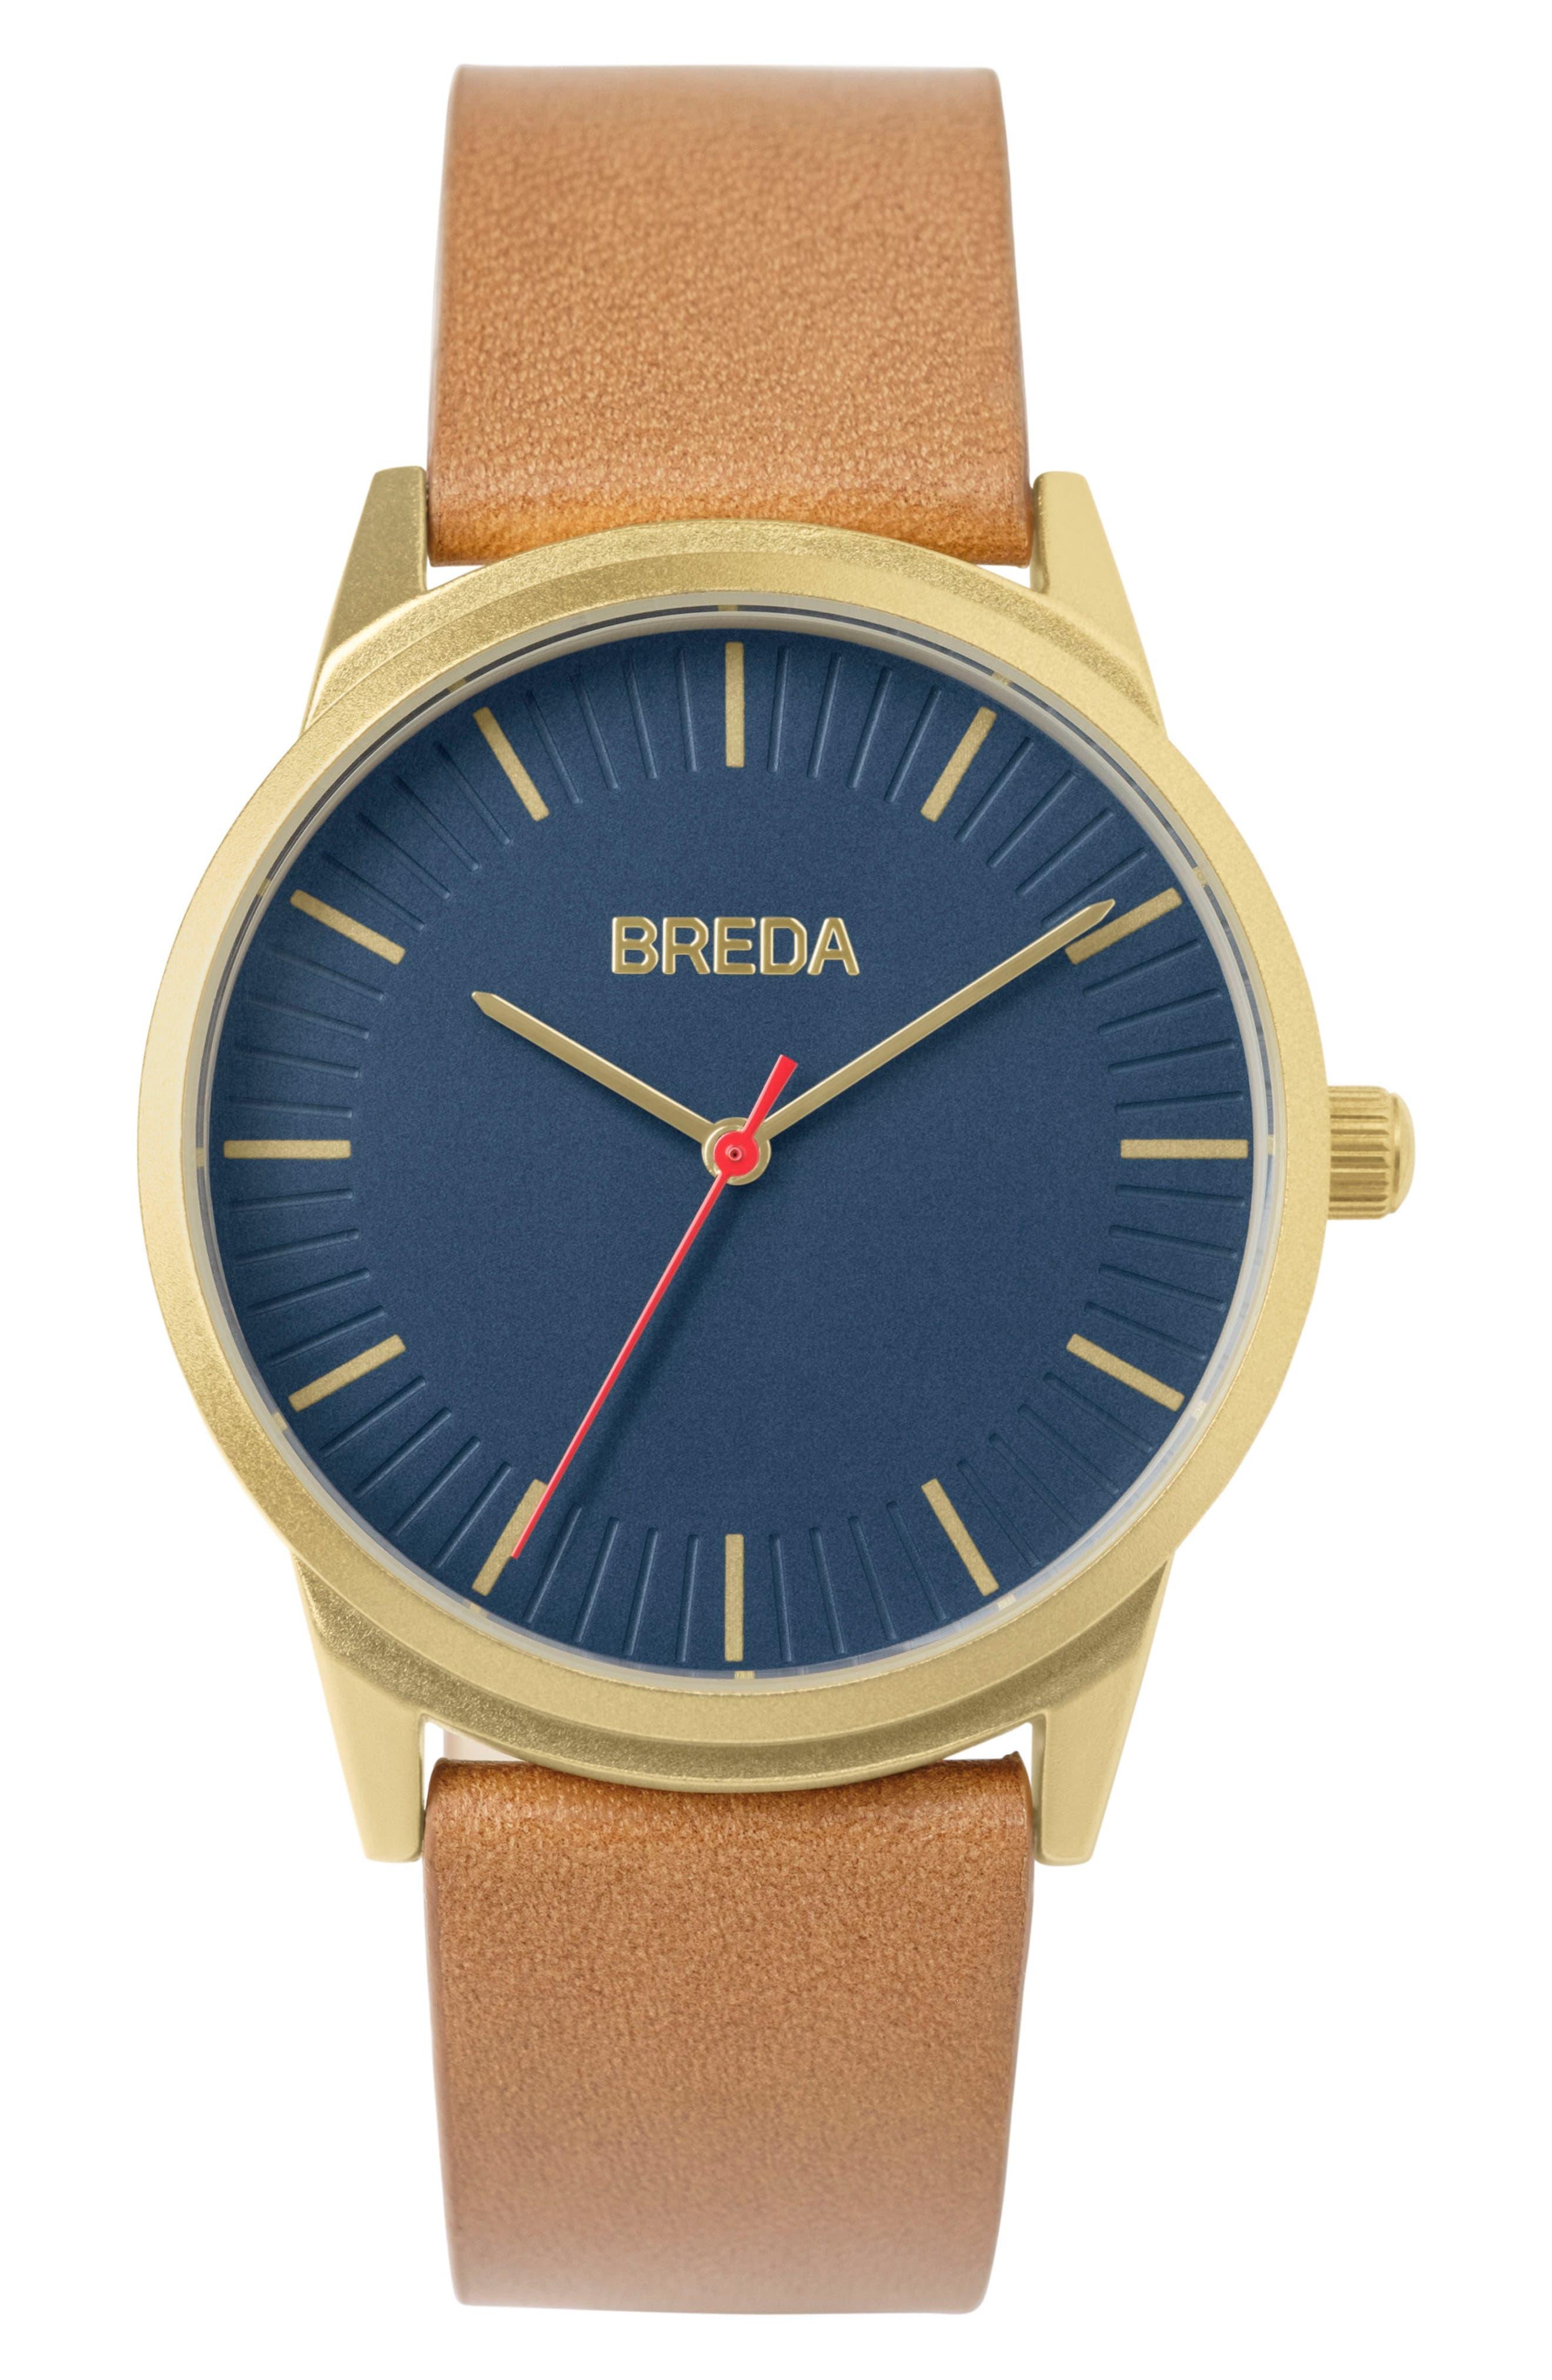 Main Image - BREDA Bresson Leather Strap Watch, 42mm